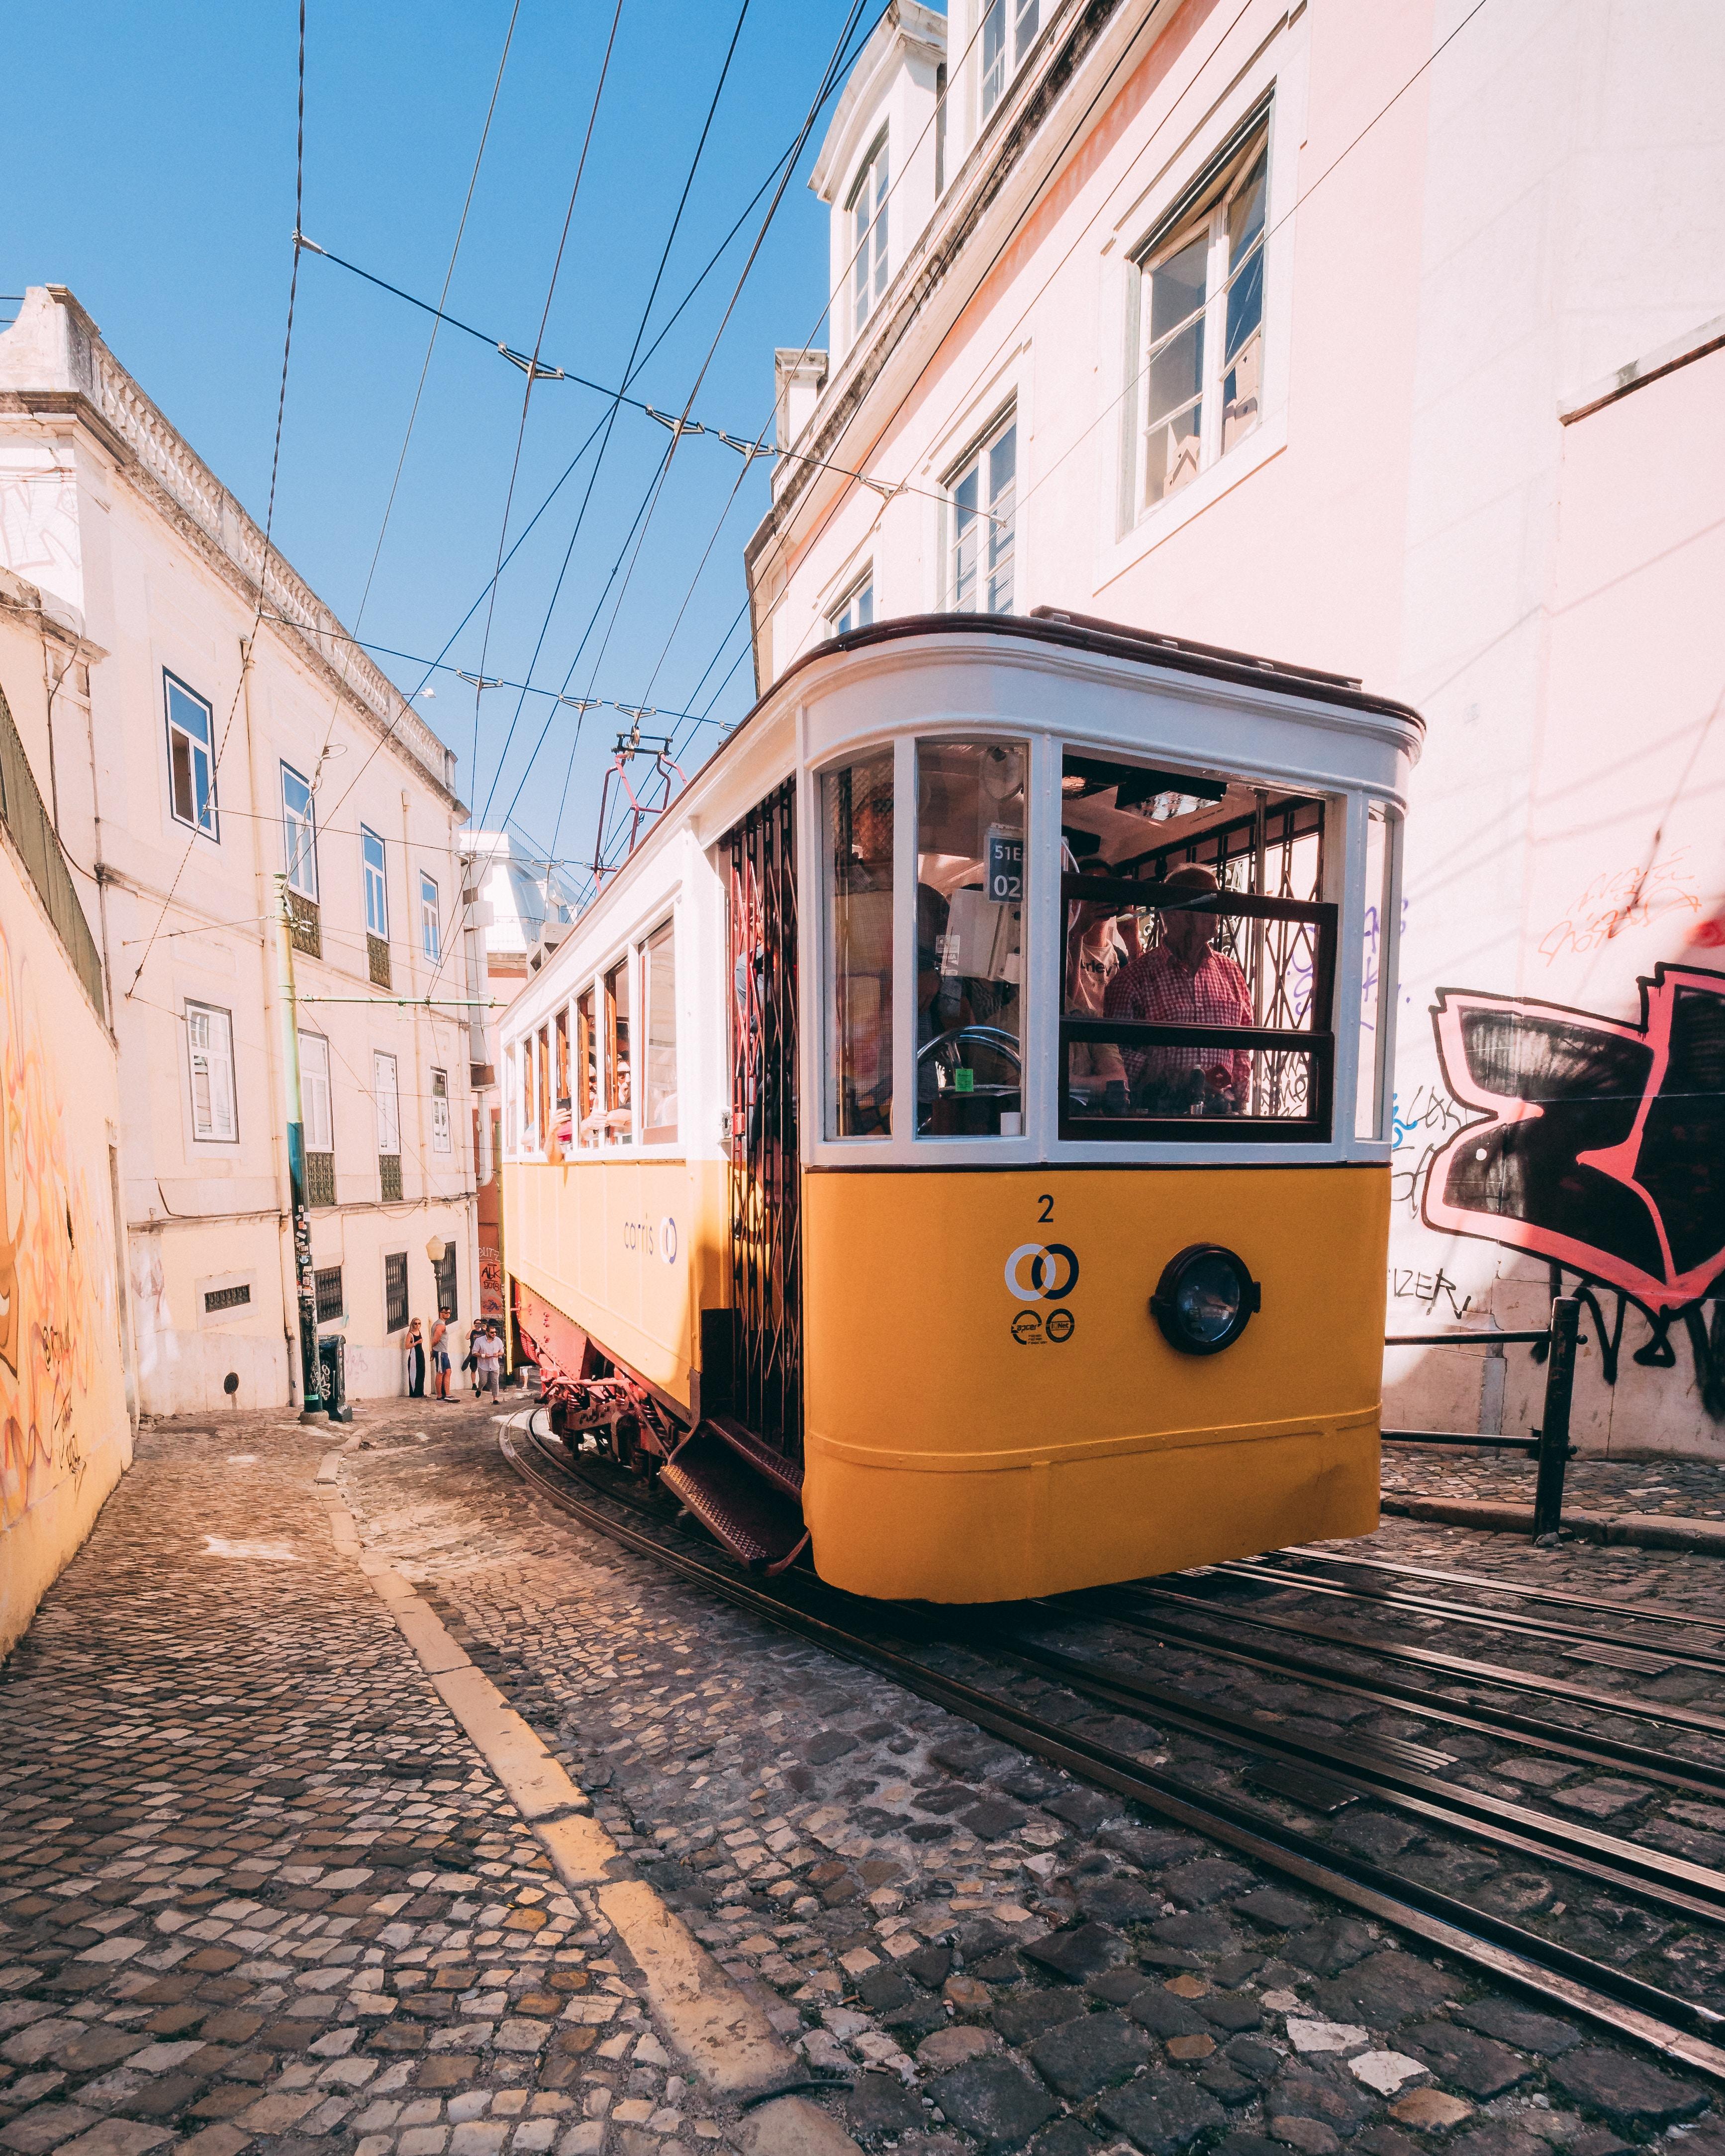 matthew foulds 6mjLGsCRGXg unsplash - Португалия - страна мечты!